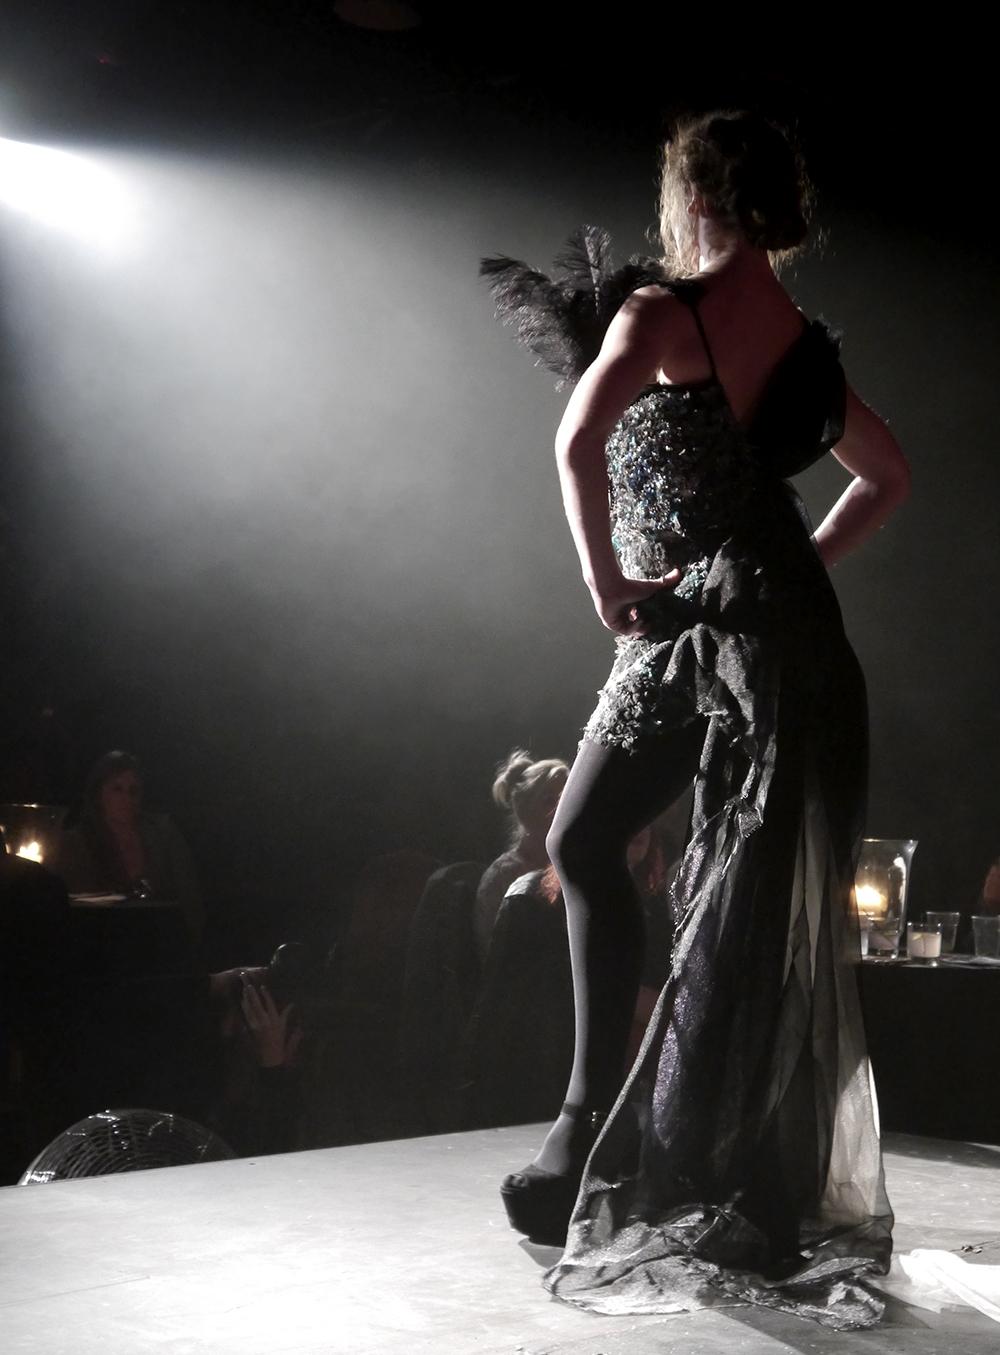 Dundee Wearable Art, Dundee Wearable Art Show, Wearable art, performance, fashion and art, Scottish Bloggers, Lorna Modeen - The Black Swan, Black Swan, Black Swan costume